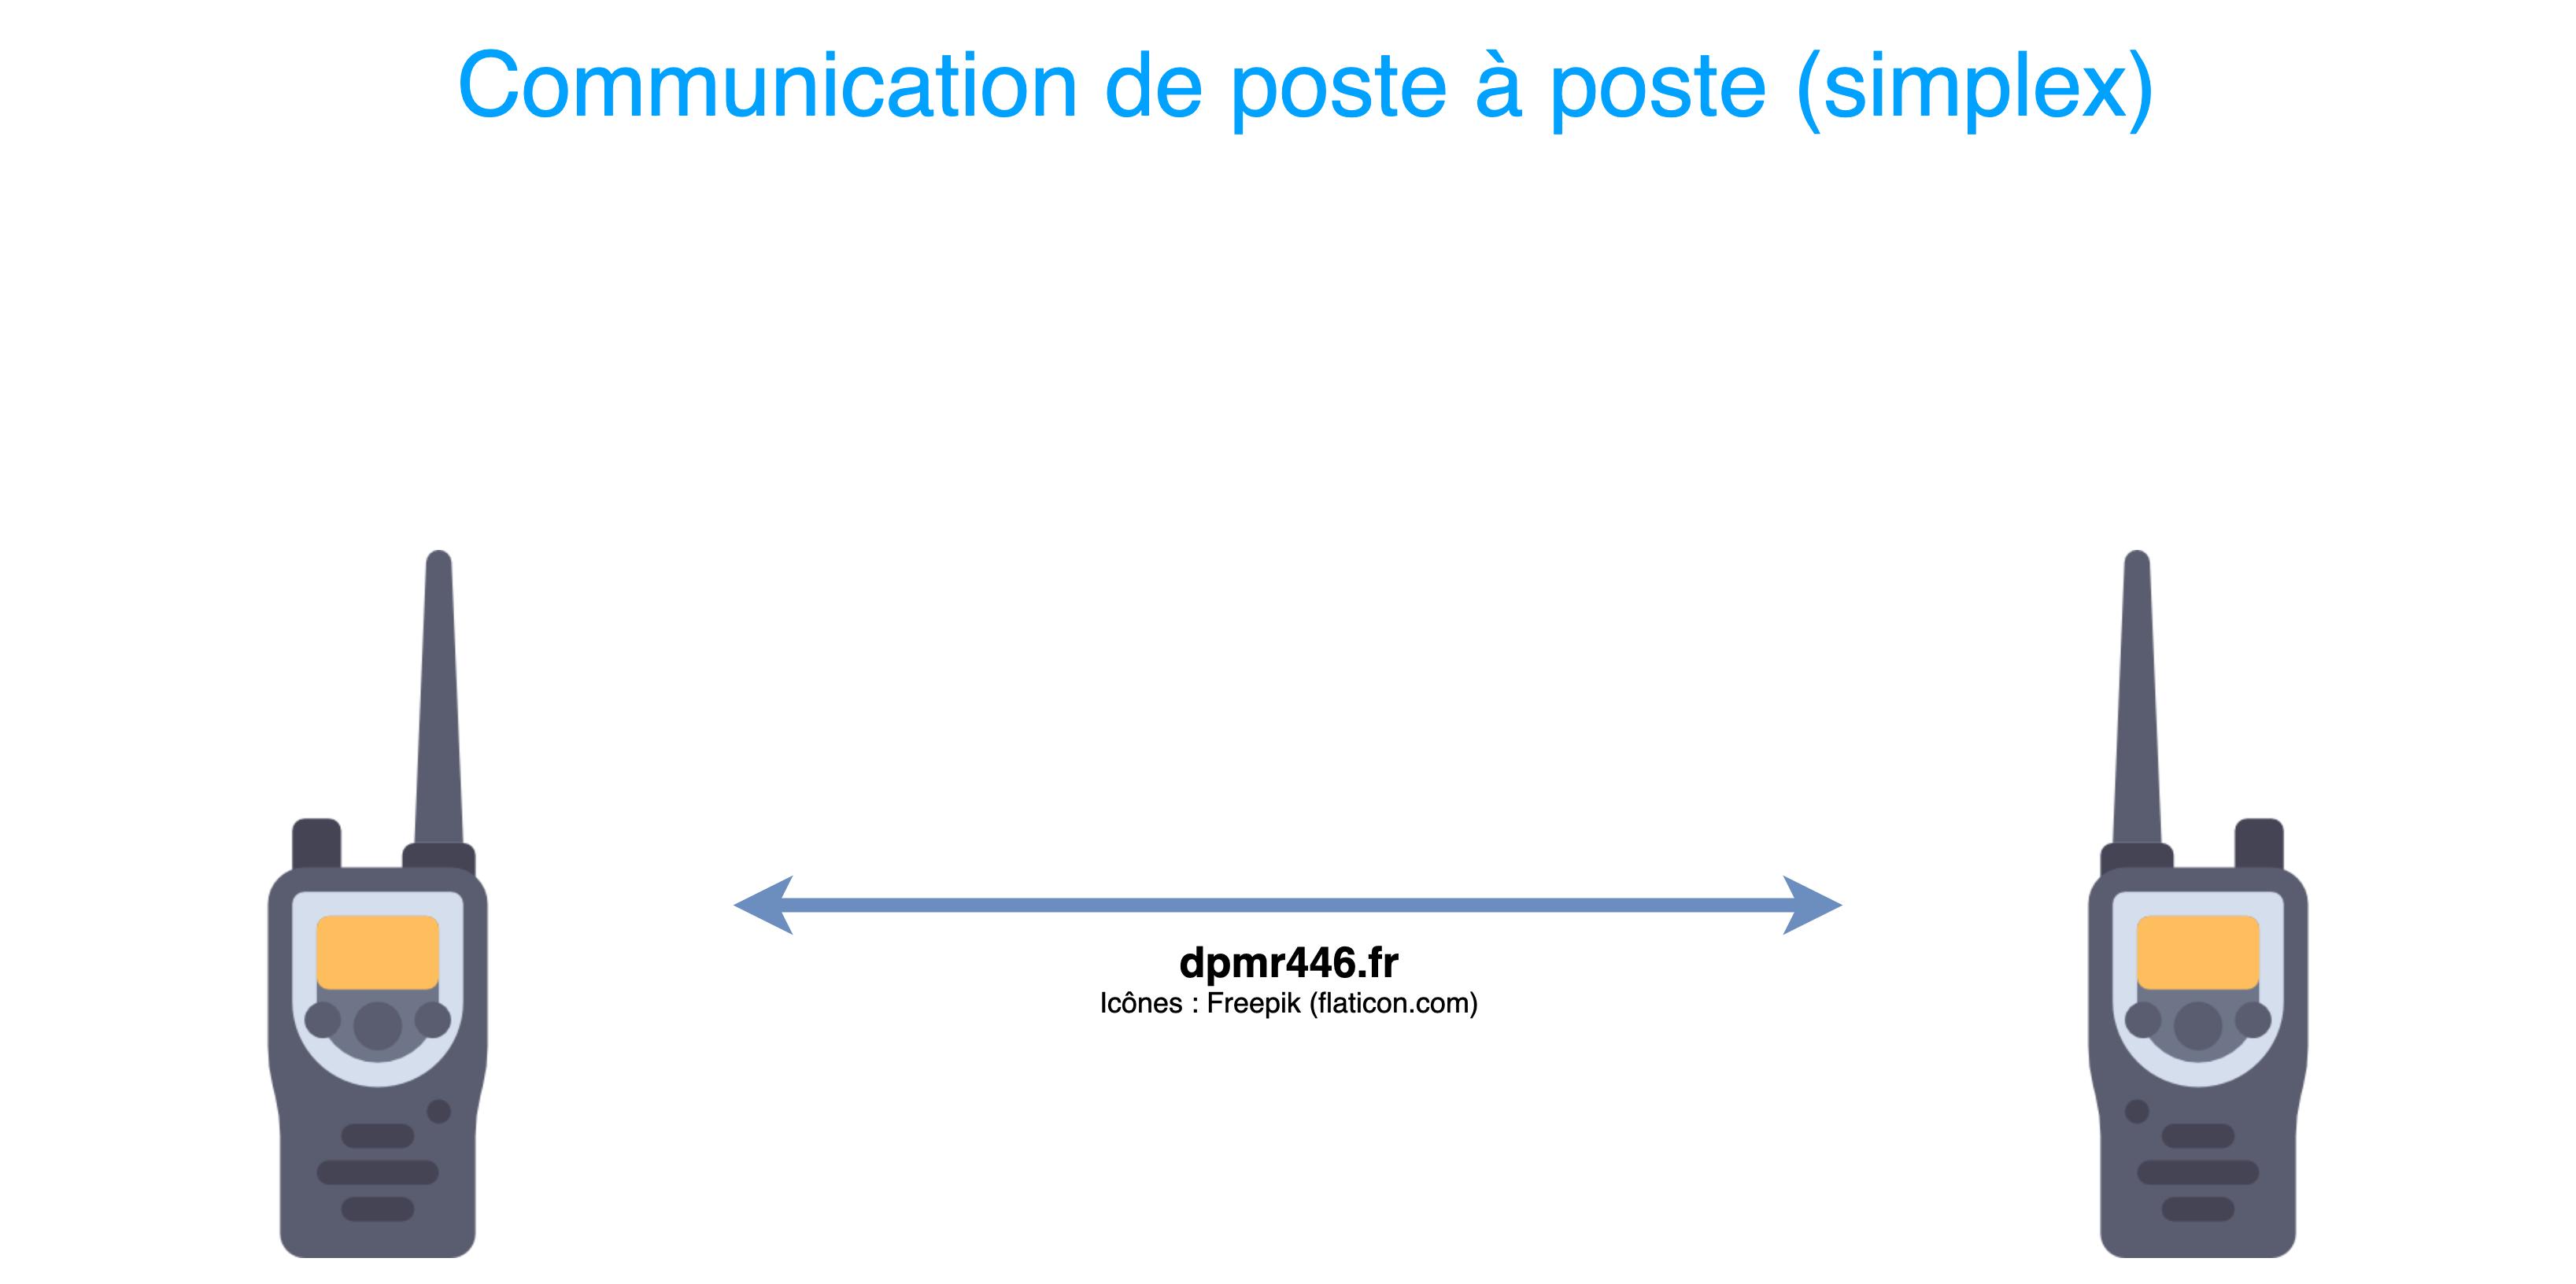 Communication simplex